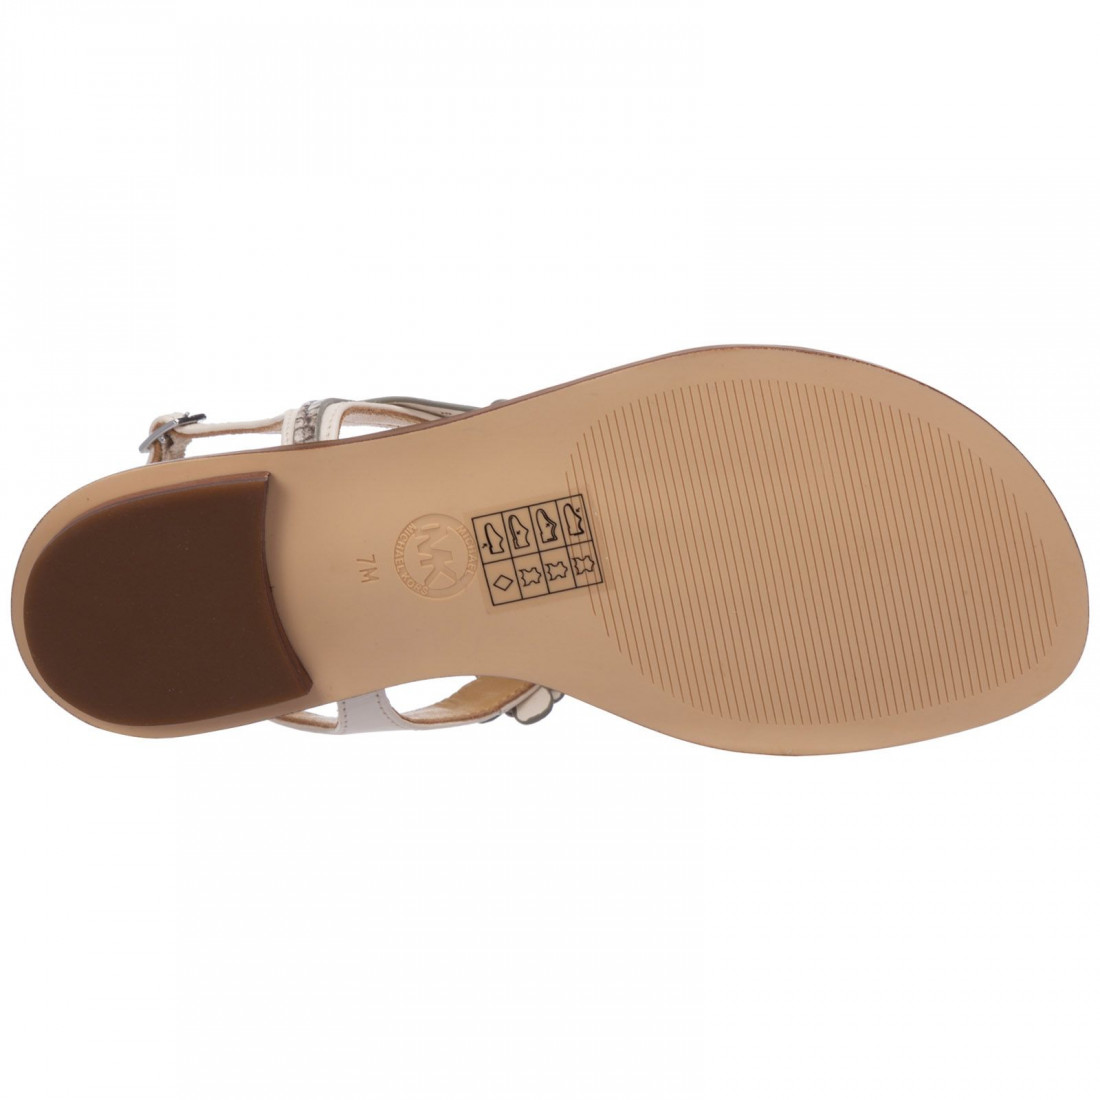 sandals woman michael kors 40s0flfa4l289 7375